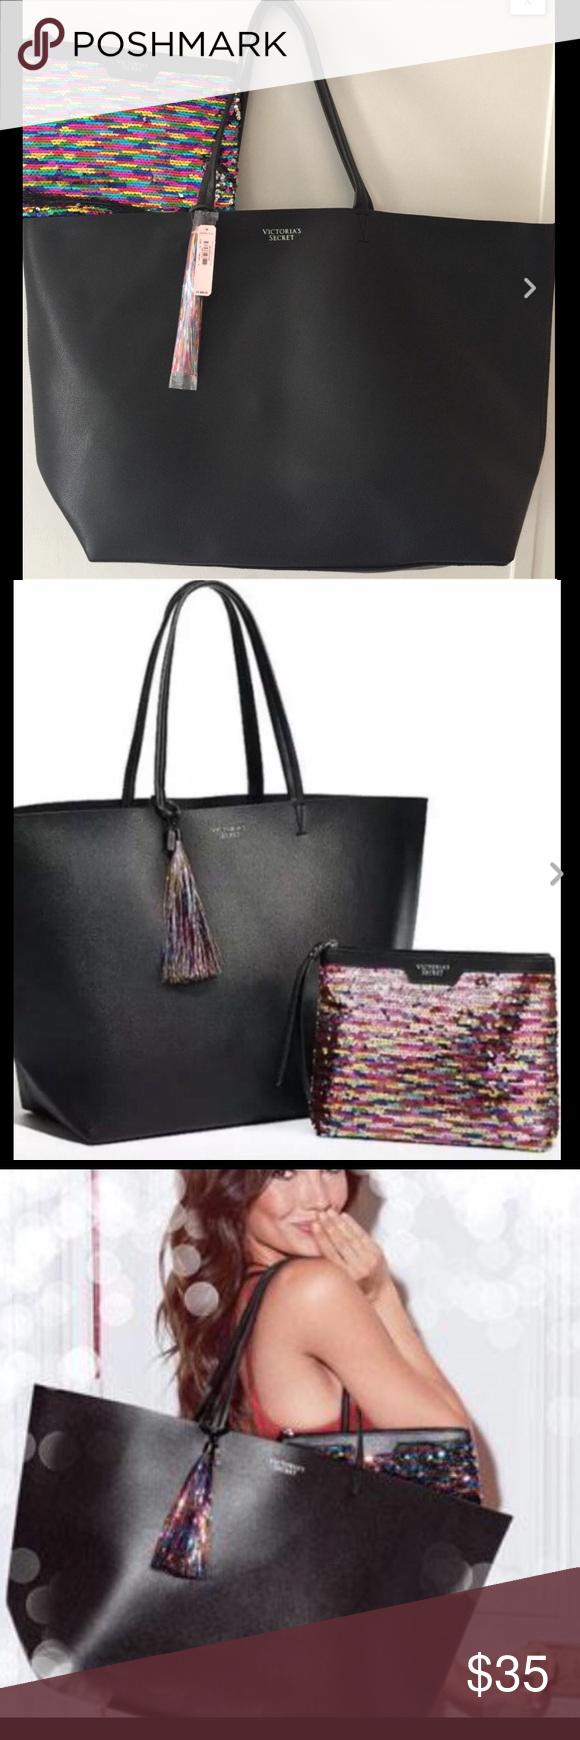 0860309fb8e0 Brand NWT Victoria s Secret Black Tote w MiniBag Brand new! Extra Large  Size! Fast Shipping! No Trades. PINK Victoria s Secret Bags Totes